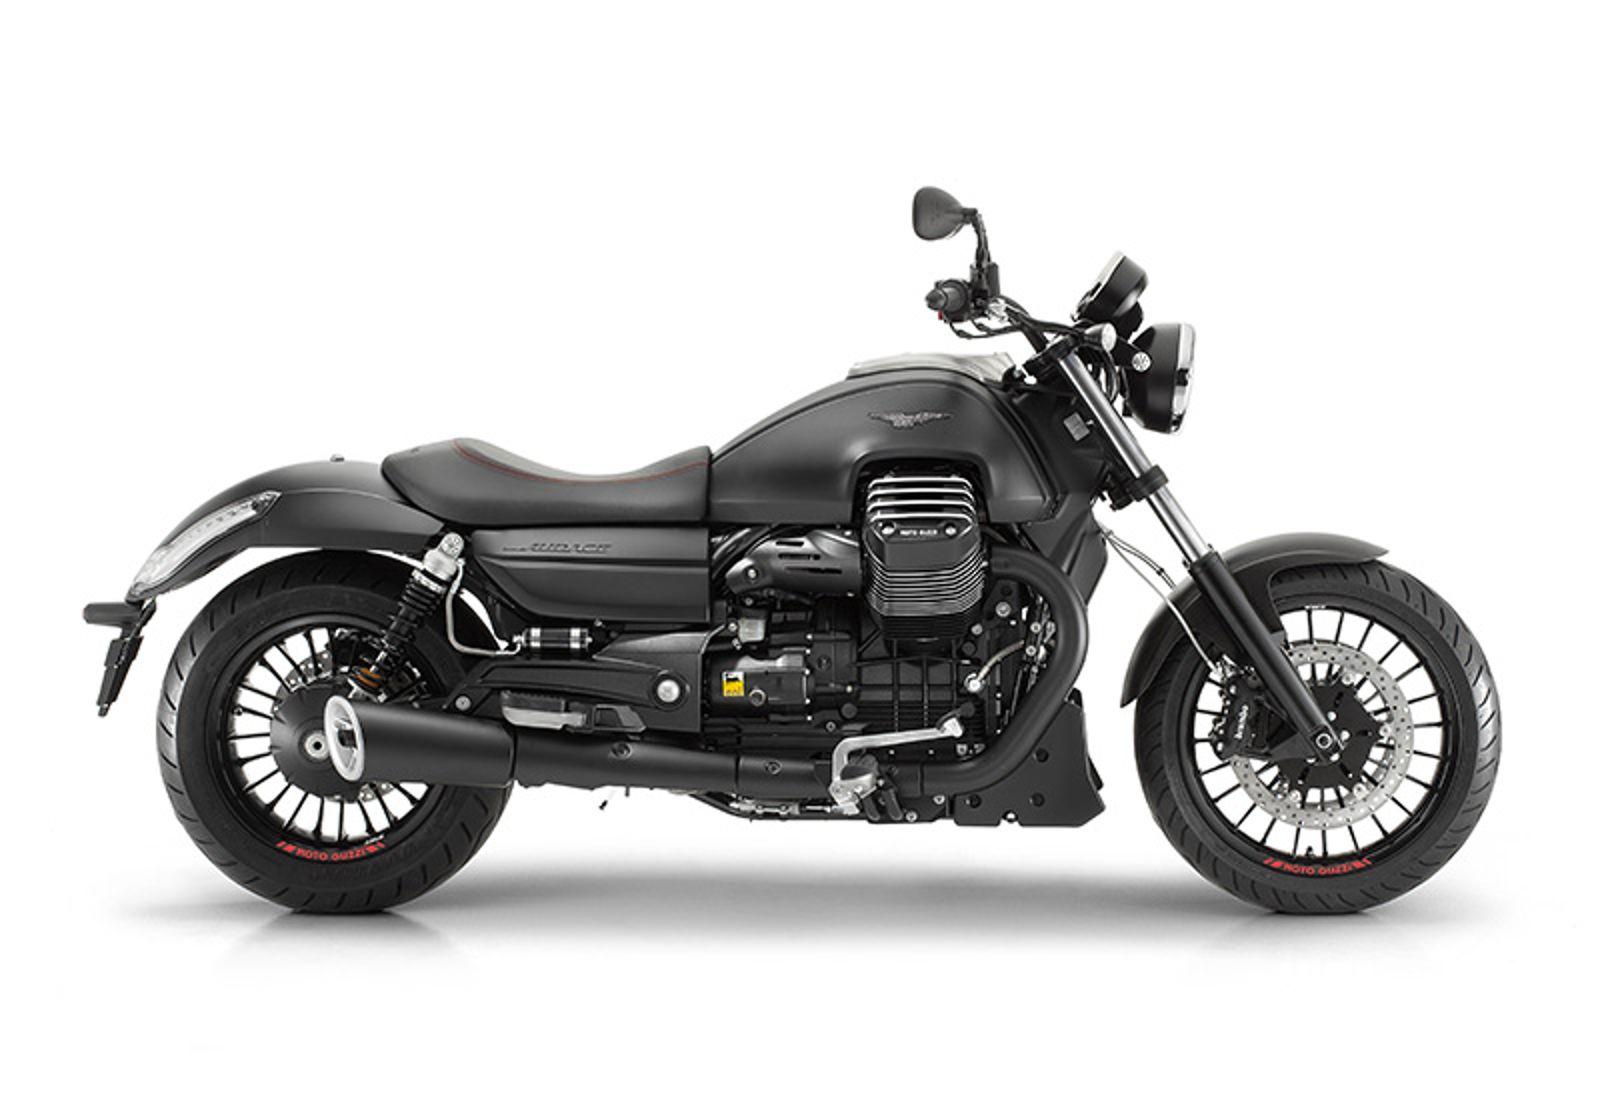 imagen de moto guzzi audace california vista lateral